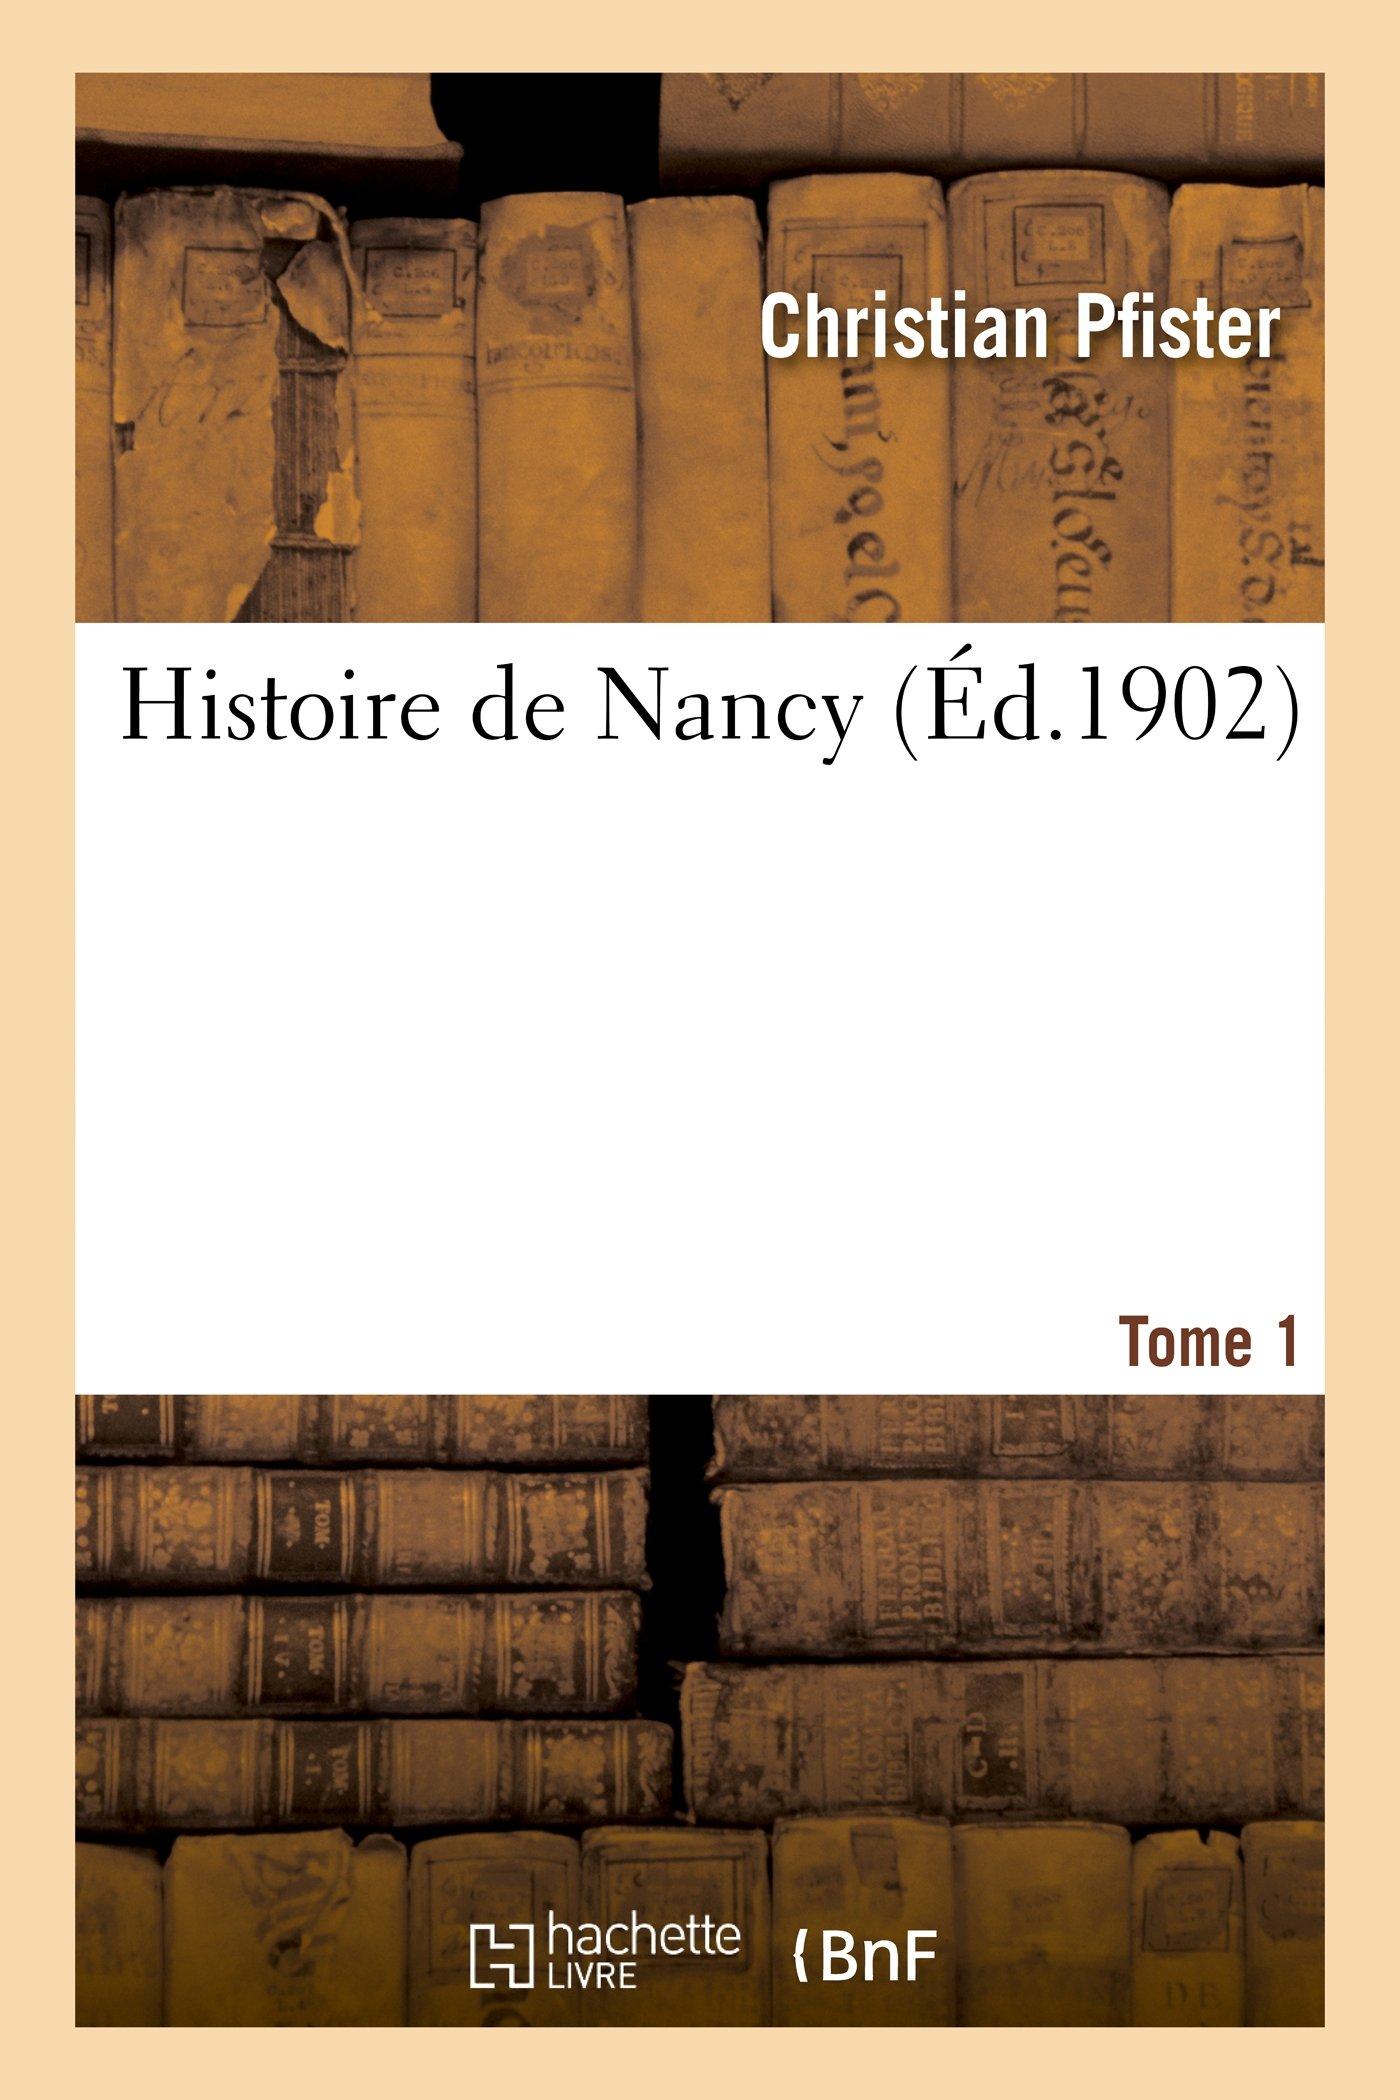 Salle De Bain Pfister ~ amazon fr histoire de nancy tome 1 christian pfister livres